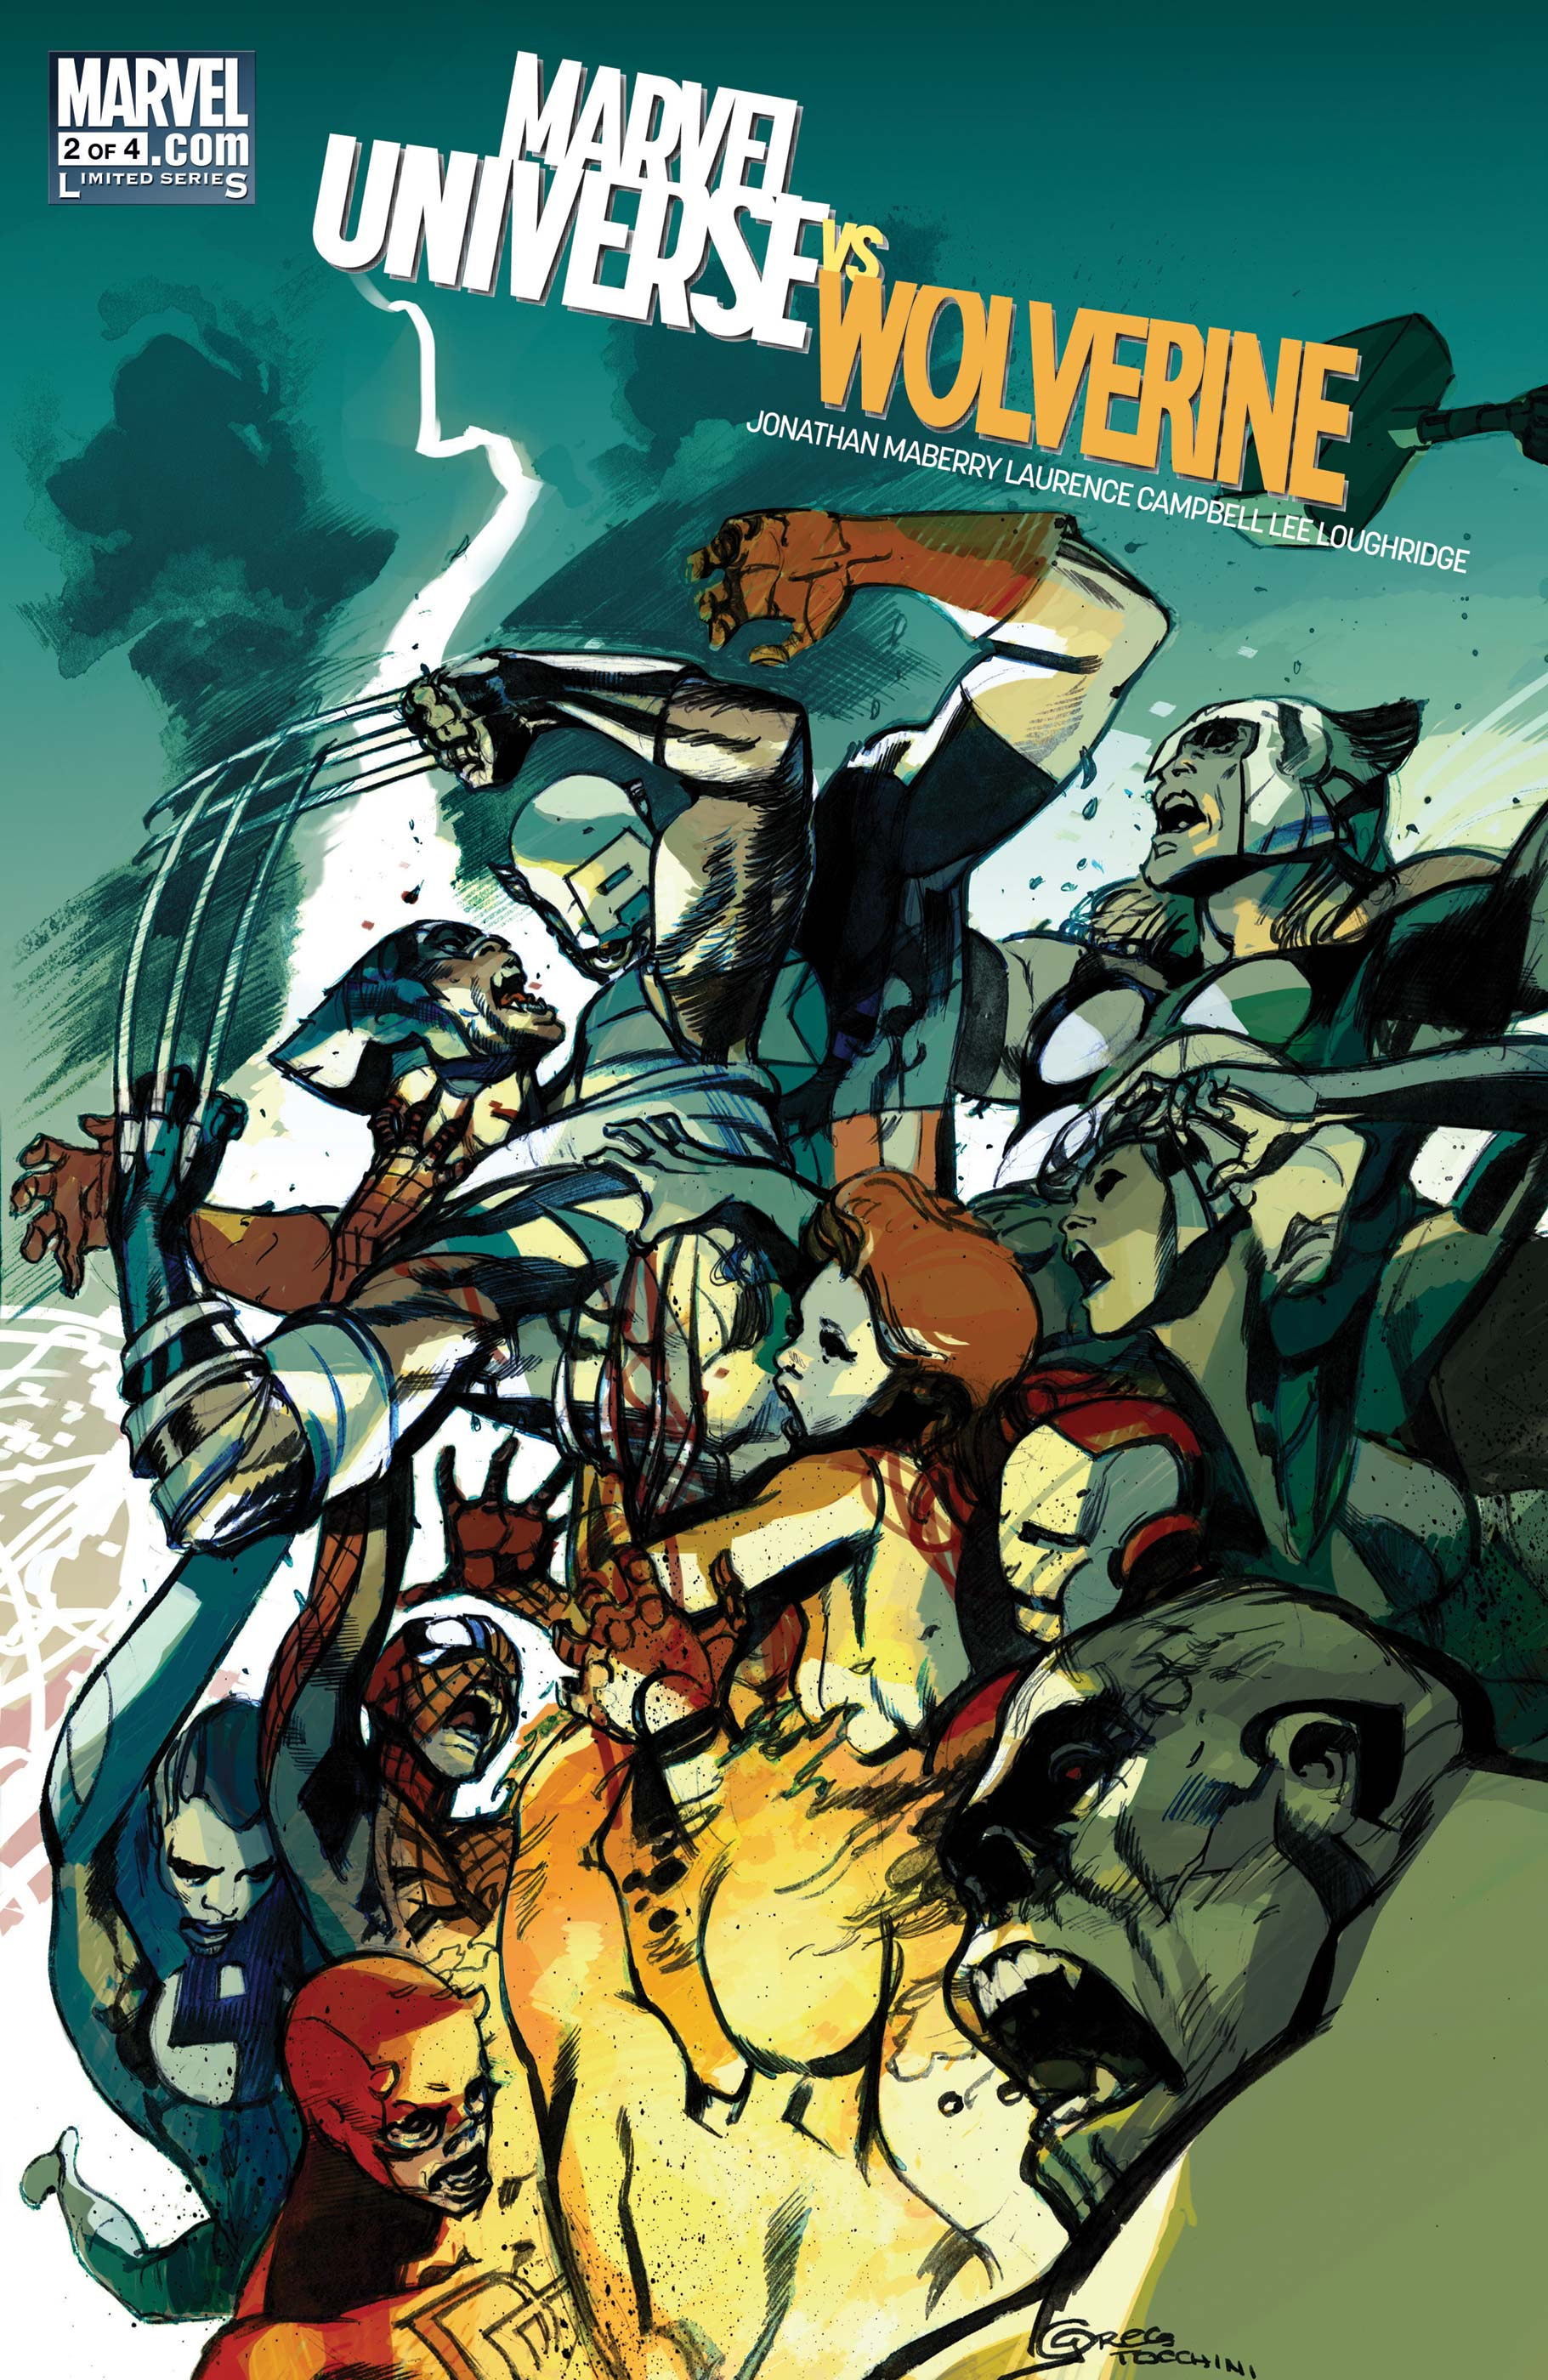 Marvel Universe Vs. Wolverine (2011) #2